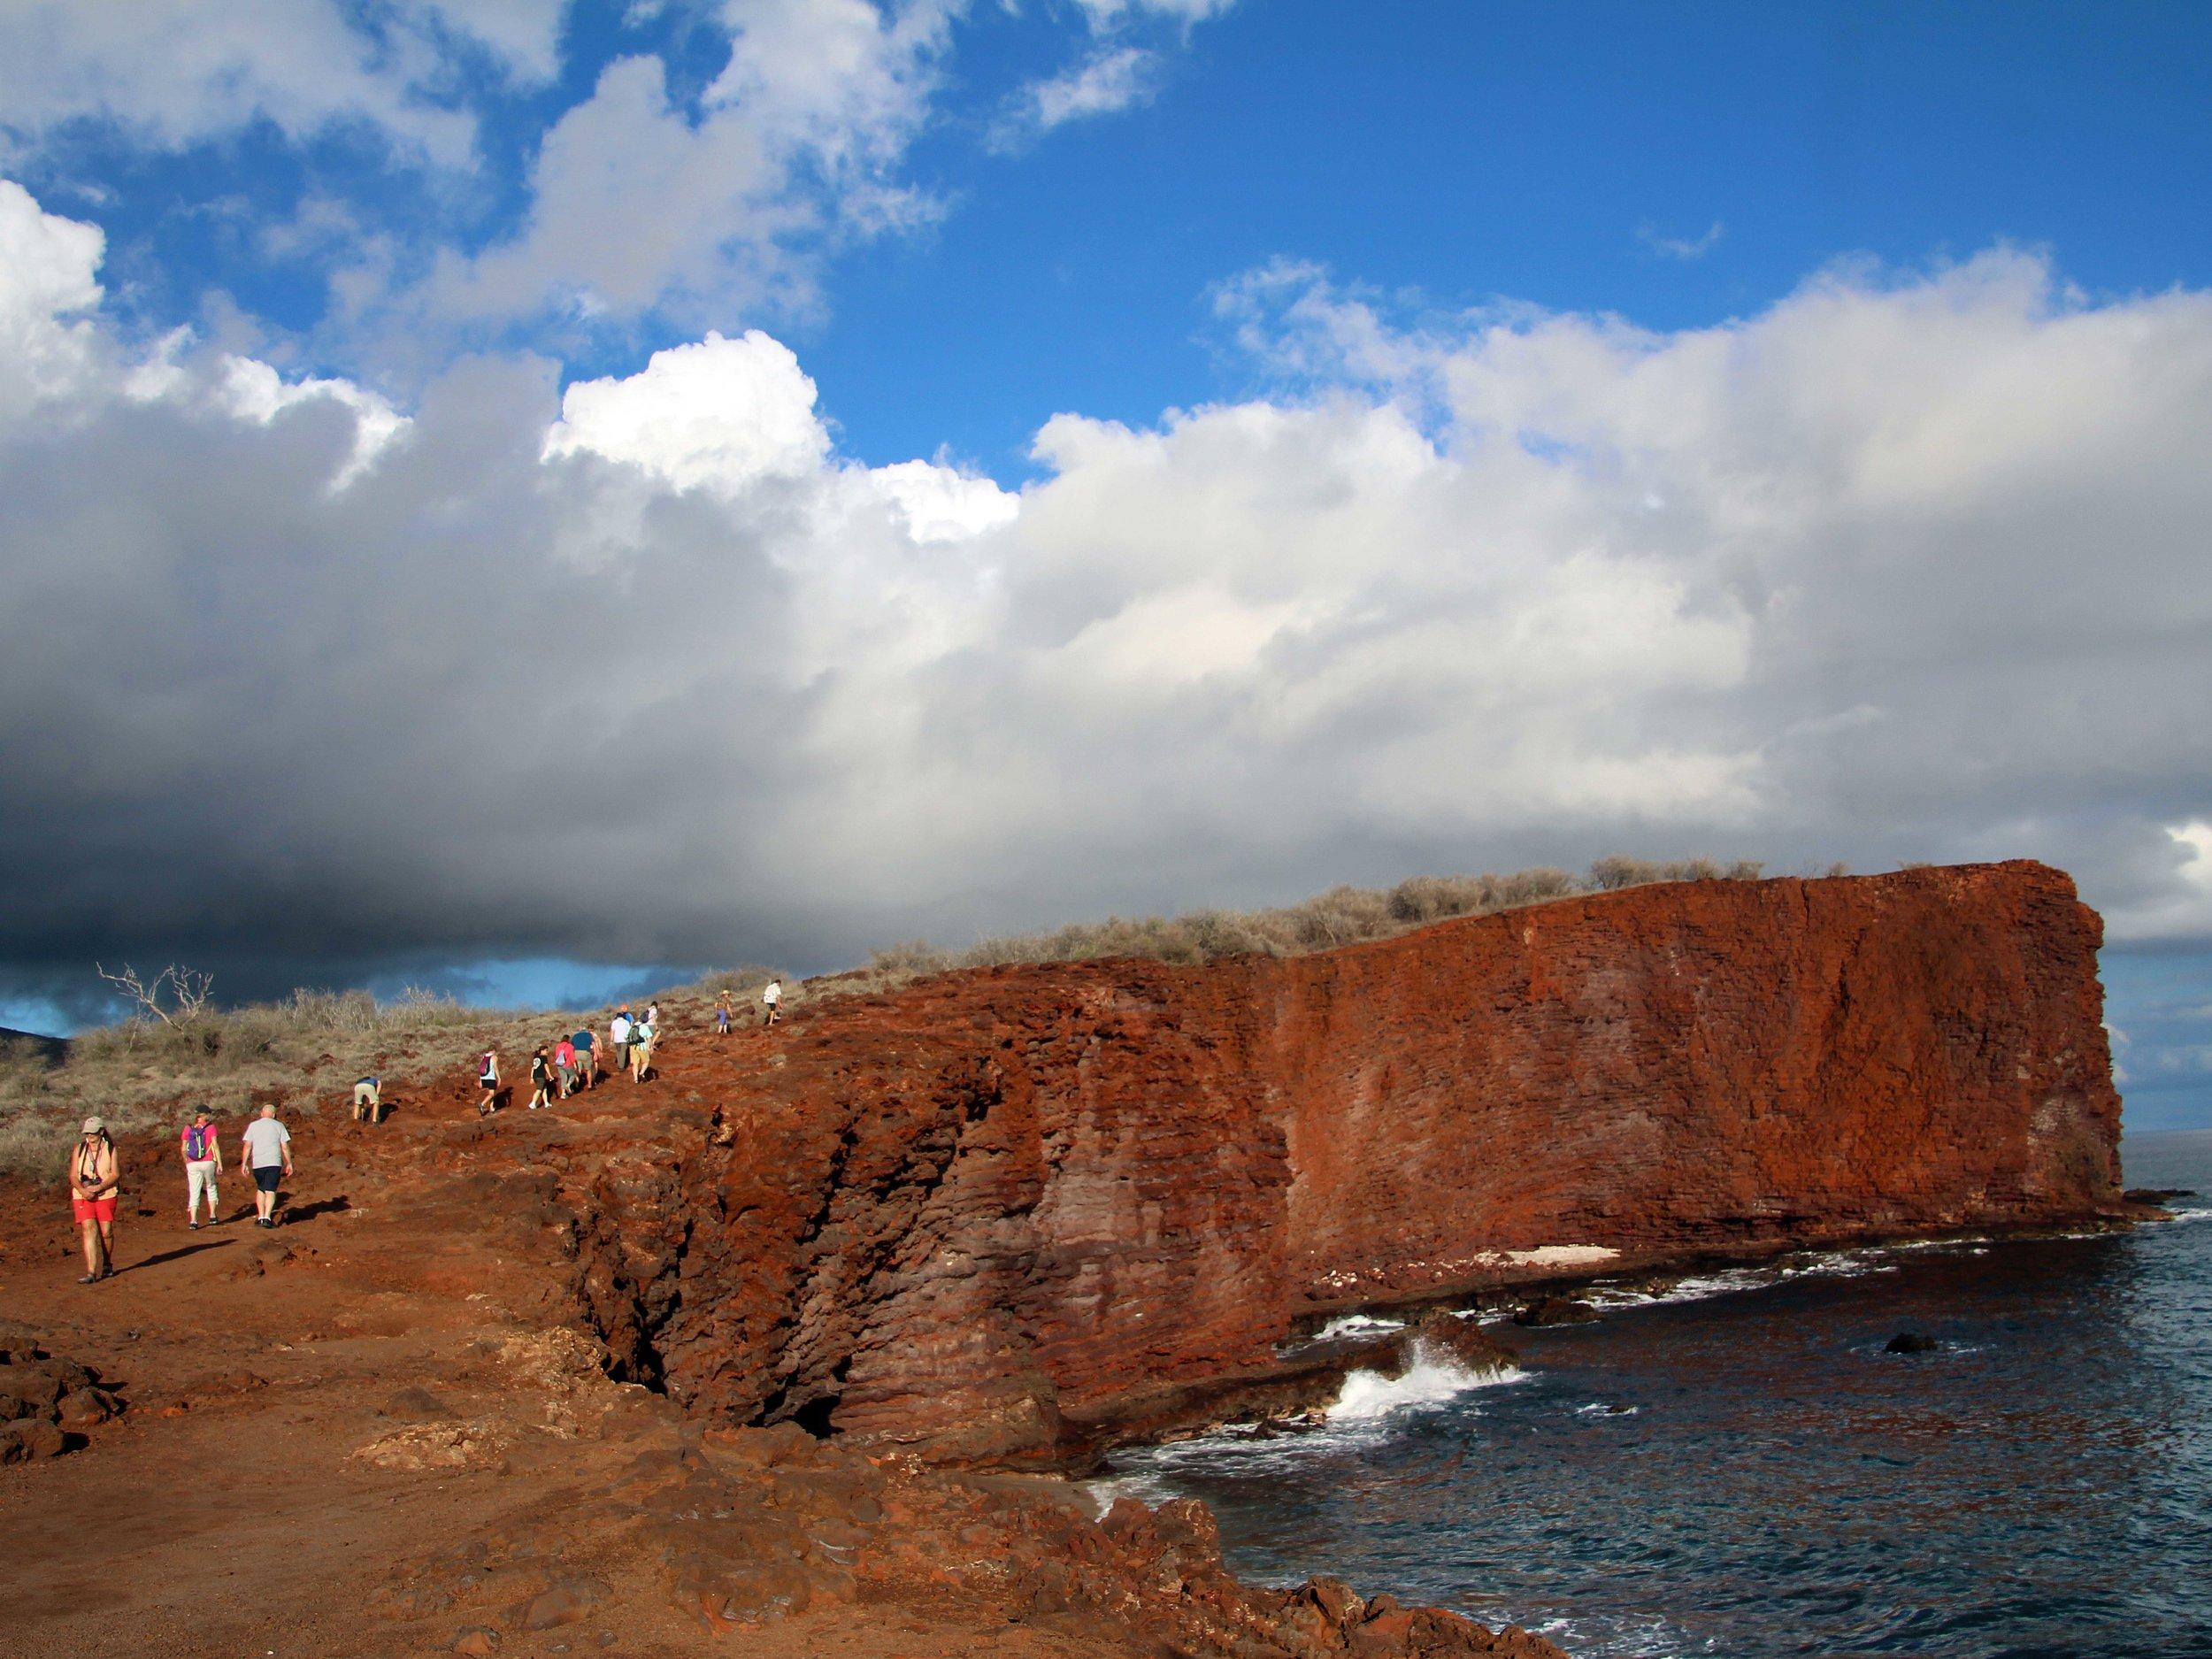 Hiking the cliffs of Manele Bay, Lanai Hawaii © Joanne DiBona Photography